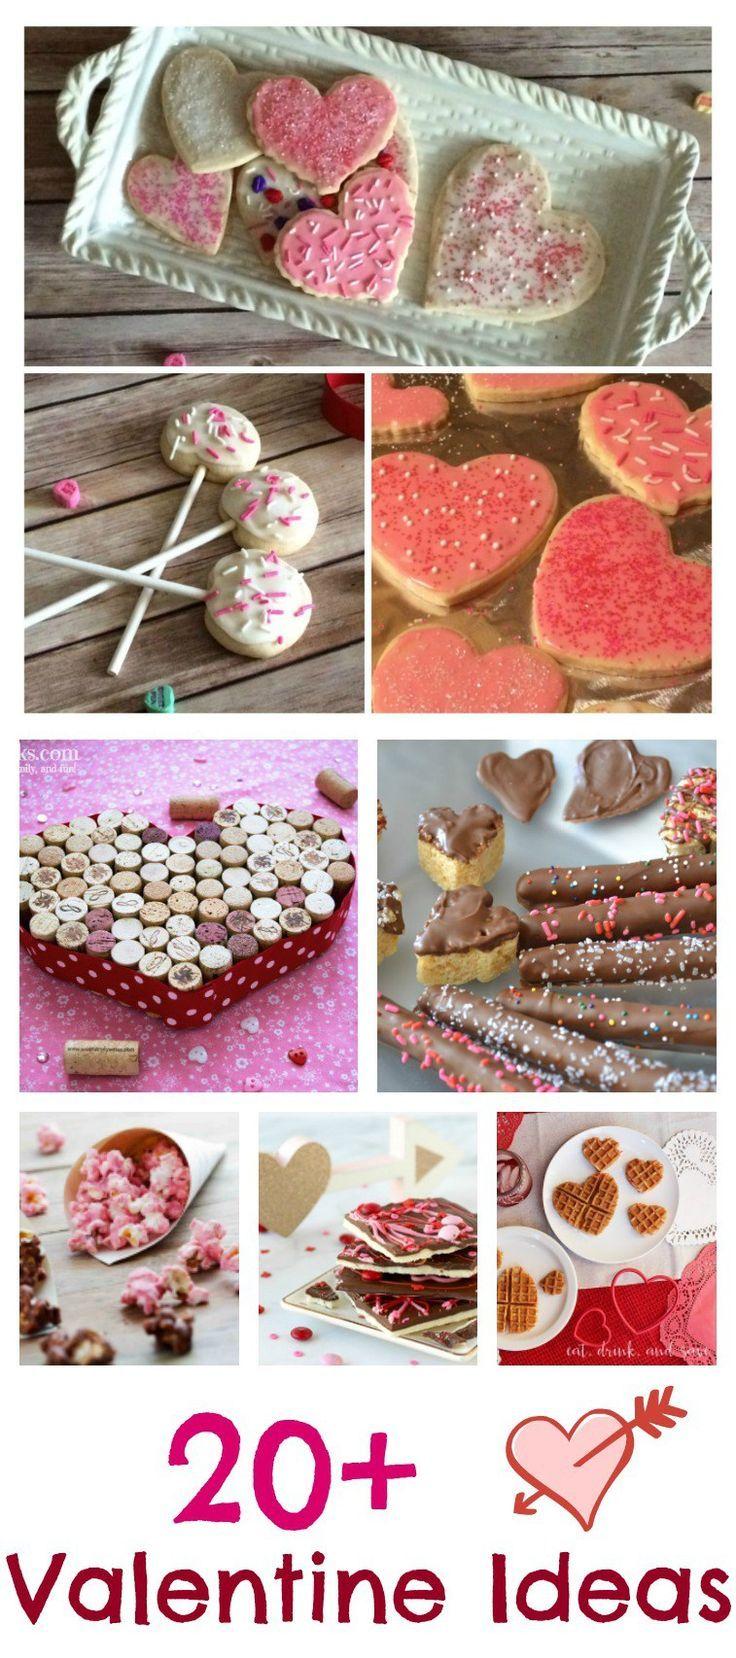 332 best Valentine's Day Recipes, Crafts, Activities & Decor ...